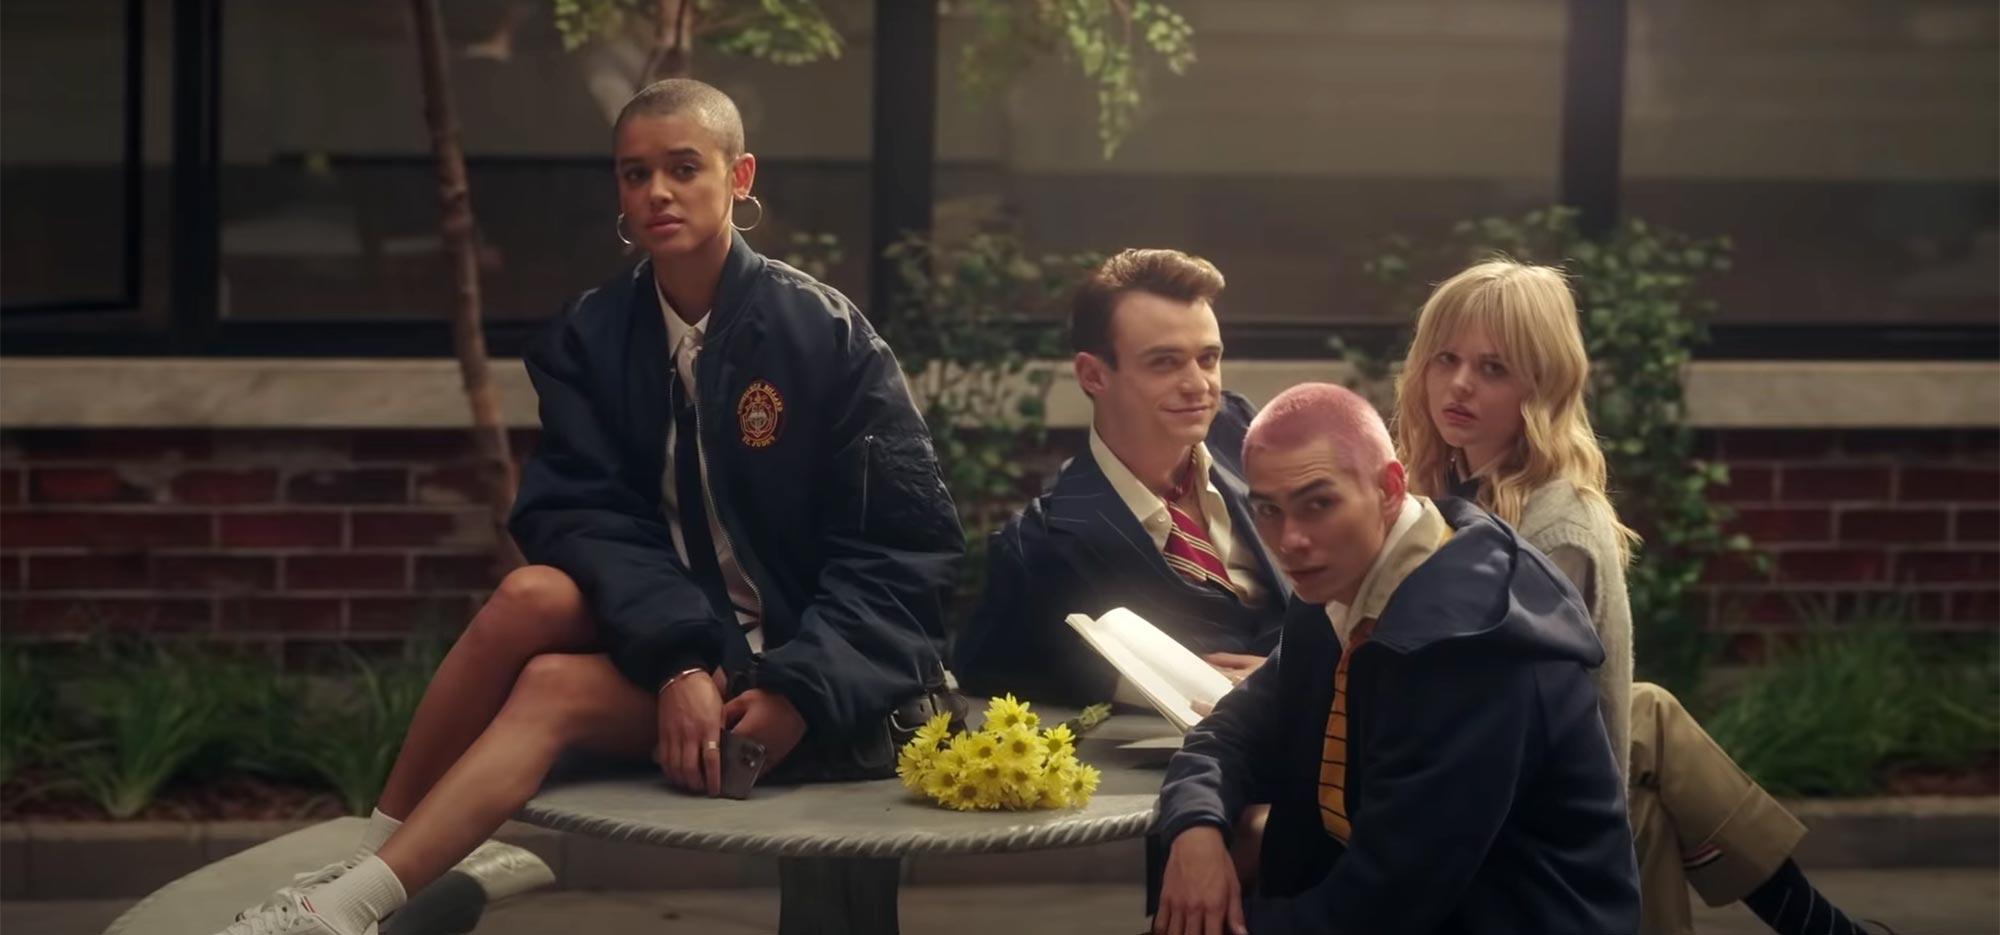 Gossip Girl | Official Trailer | HBO Max